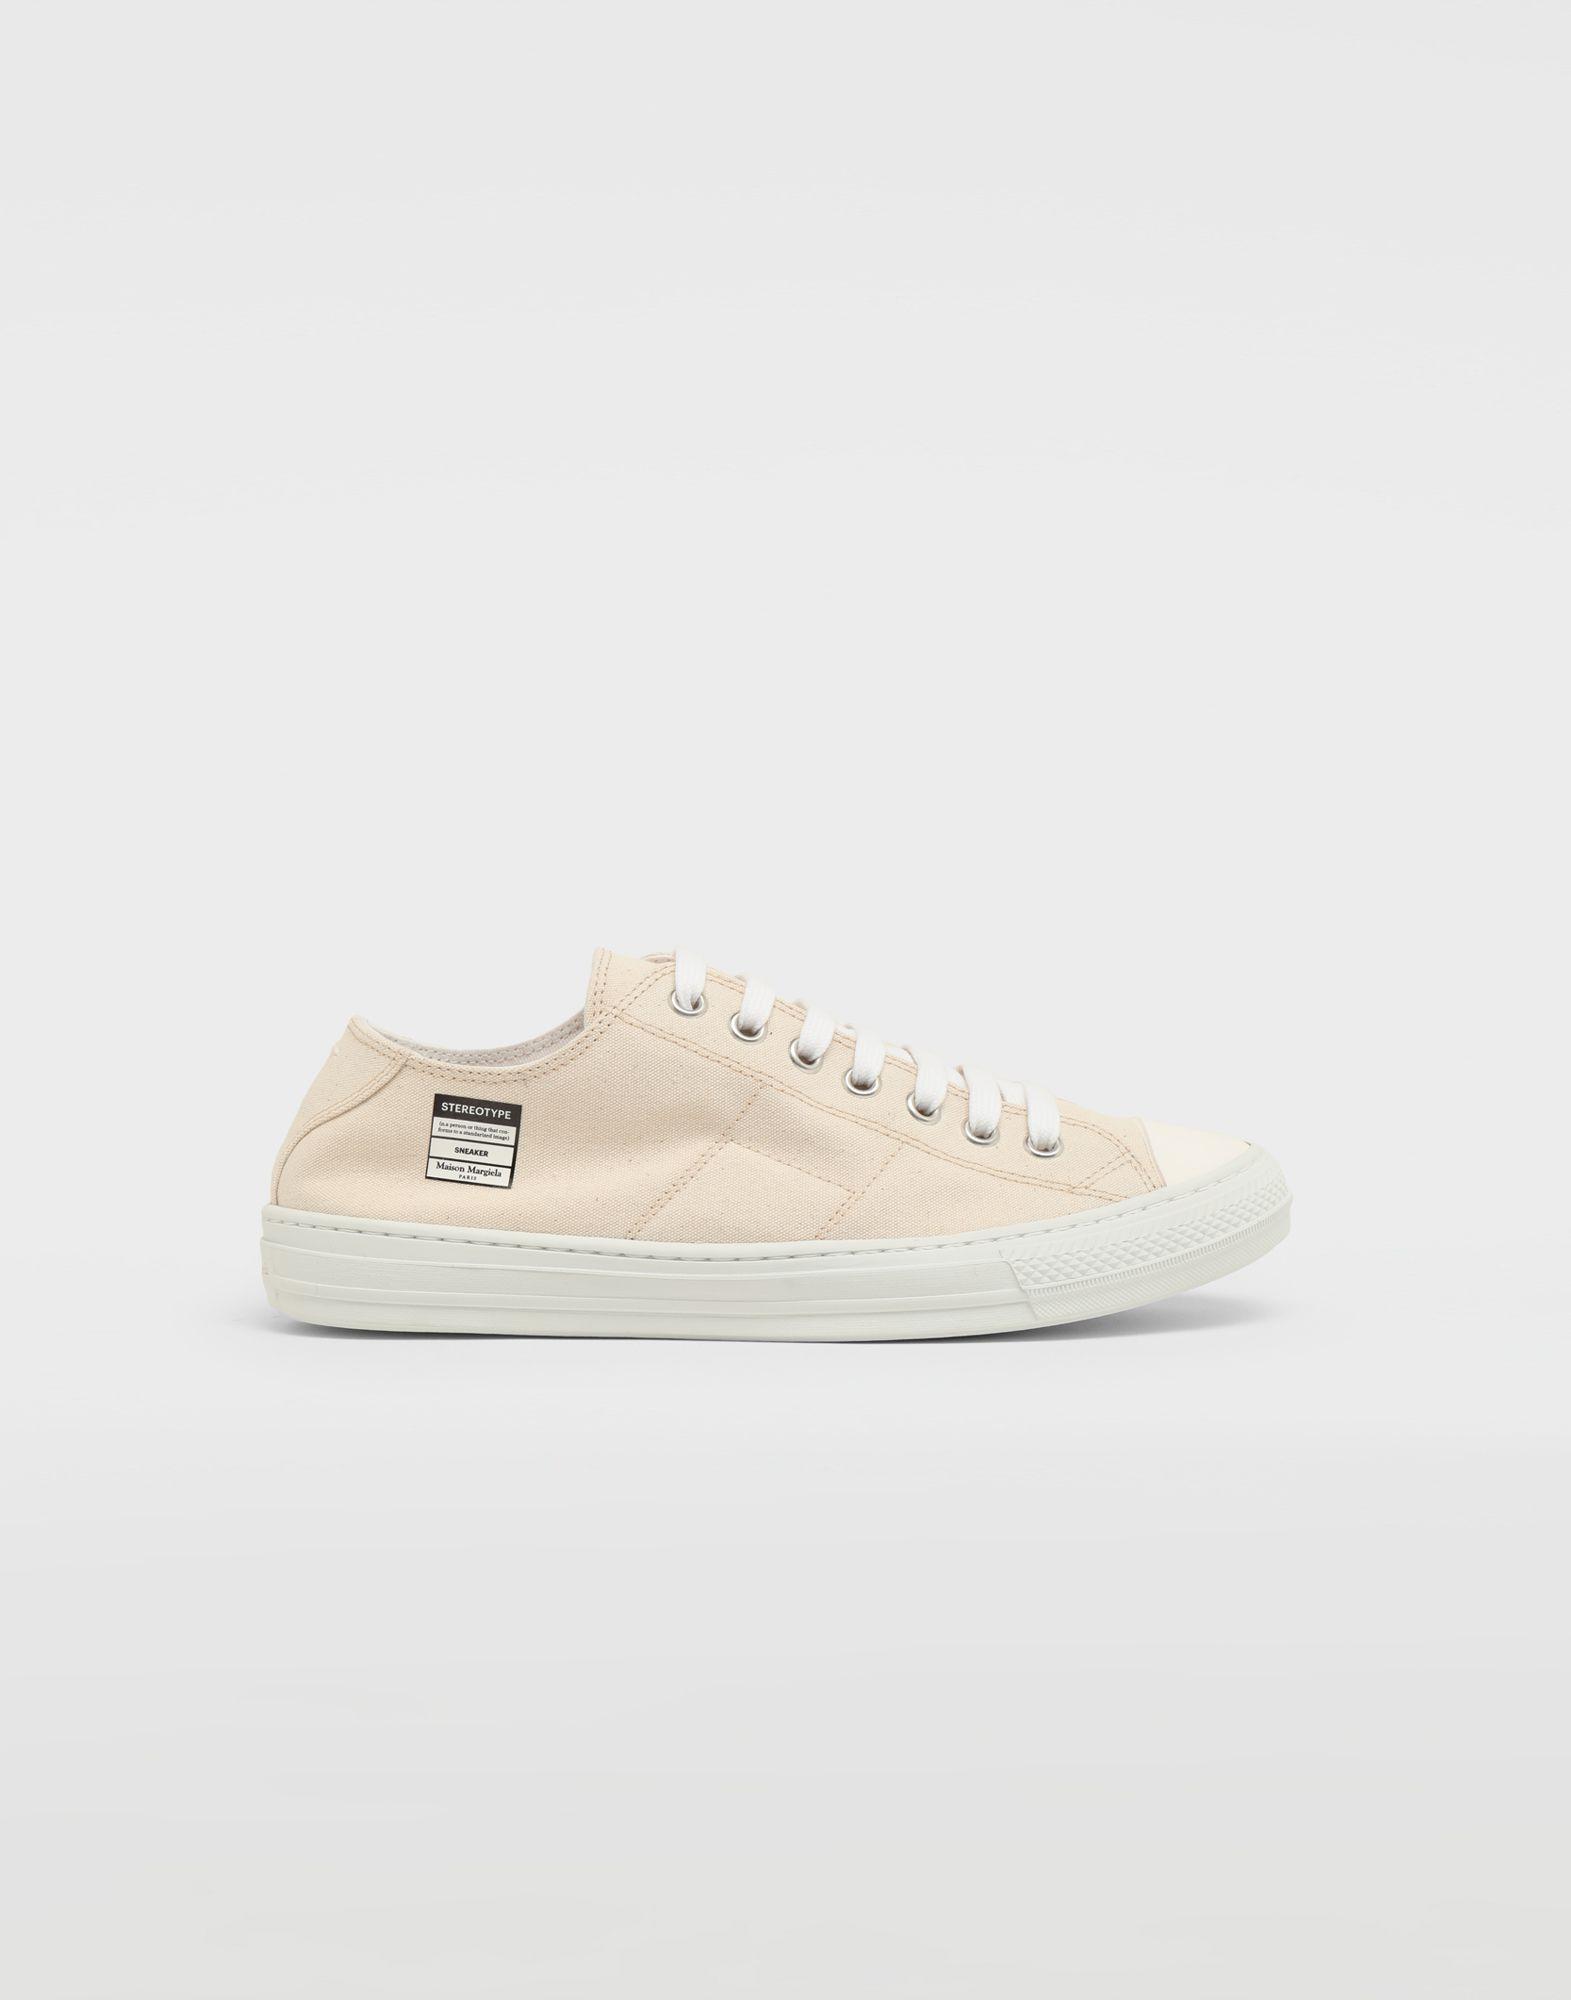 MAISON MARGIELA Low-Top-Sneakers Stereotype Sneakers Herren f